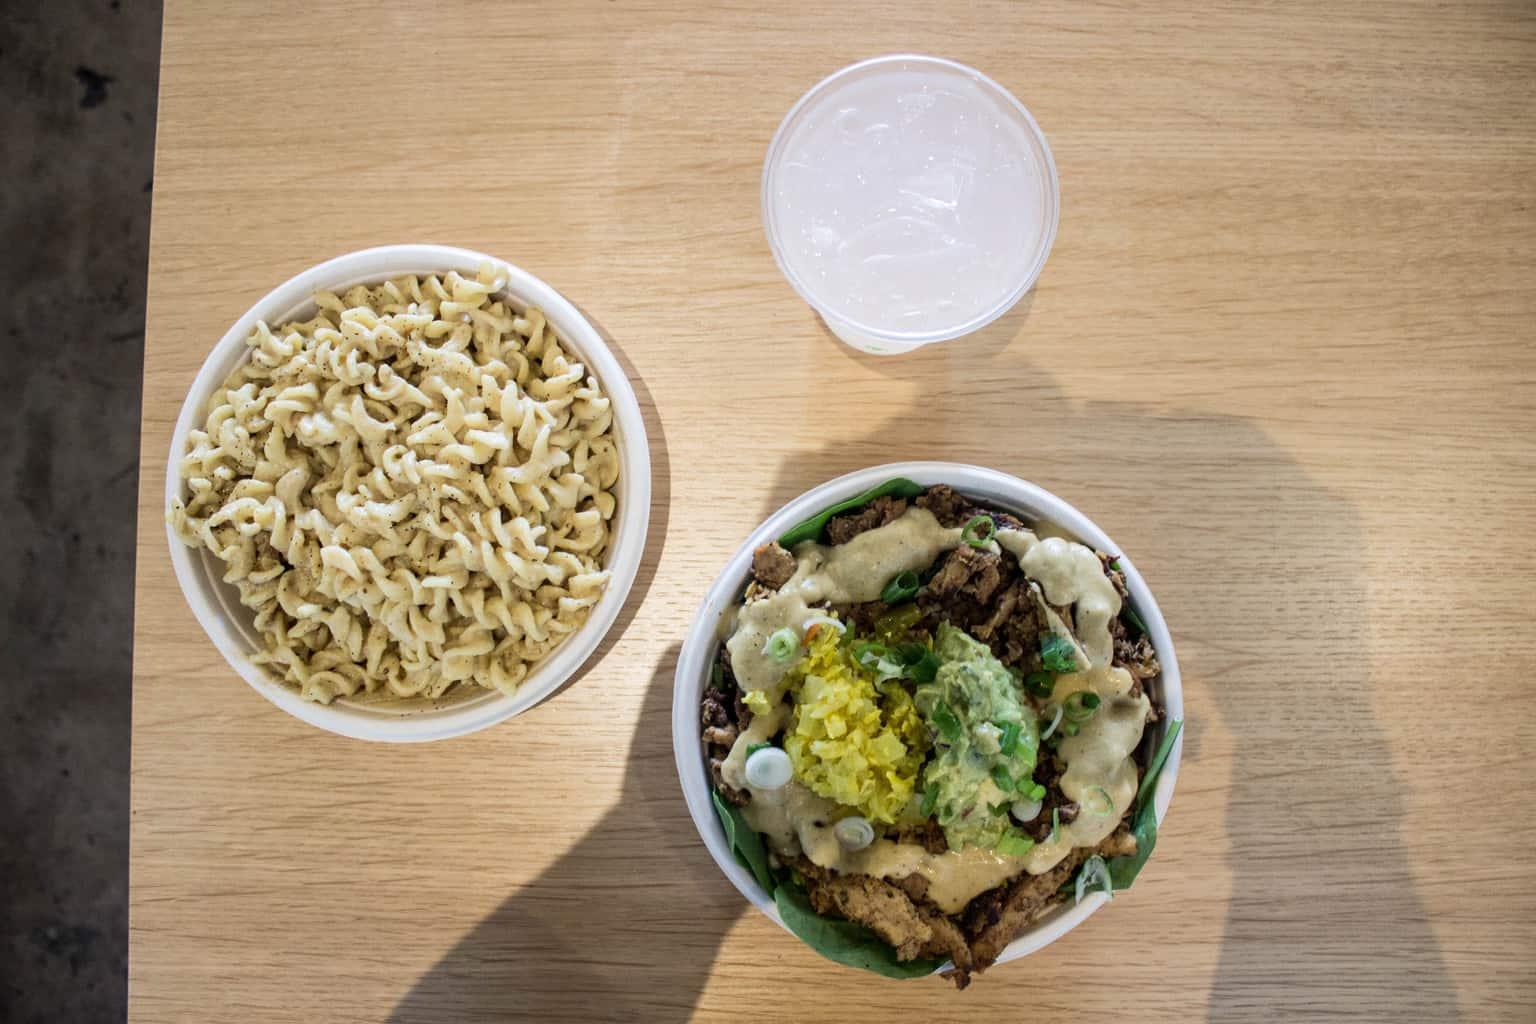 vegan restaurants in okc